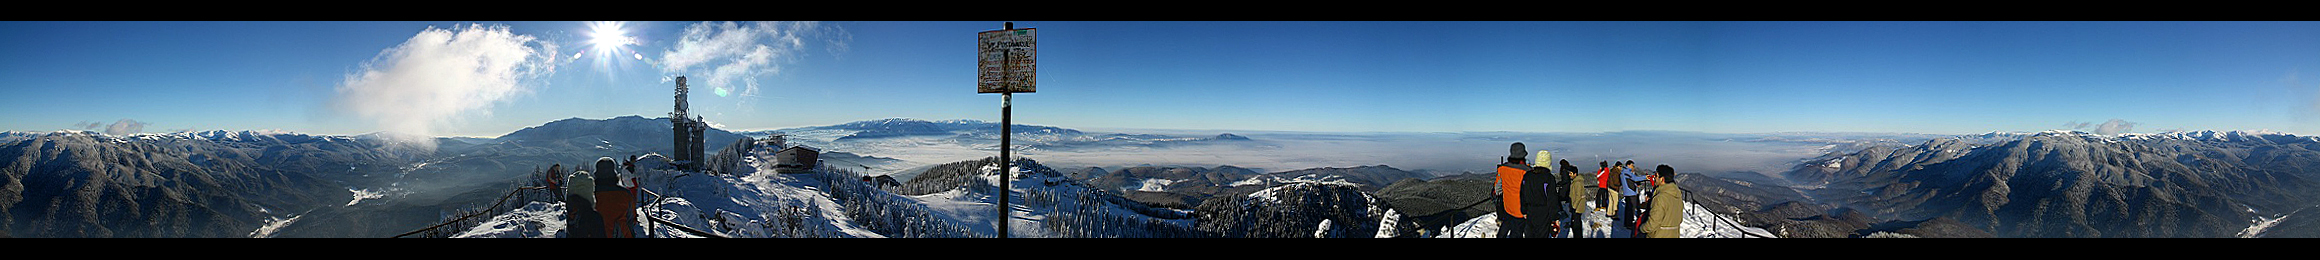 vf postavaru - 360 panorama by vxside